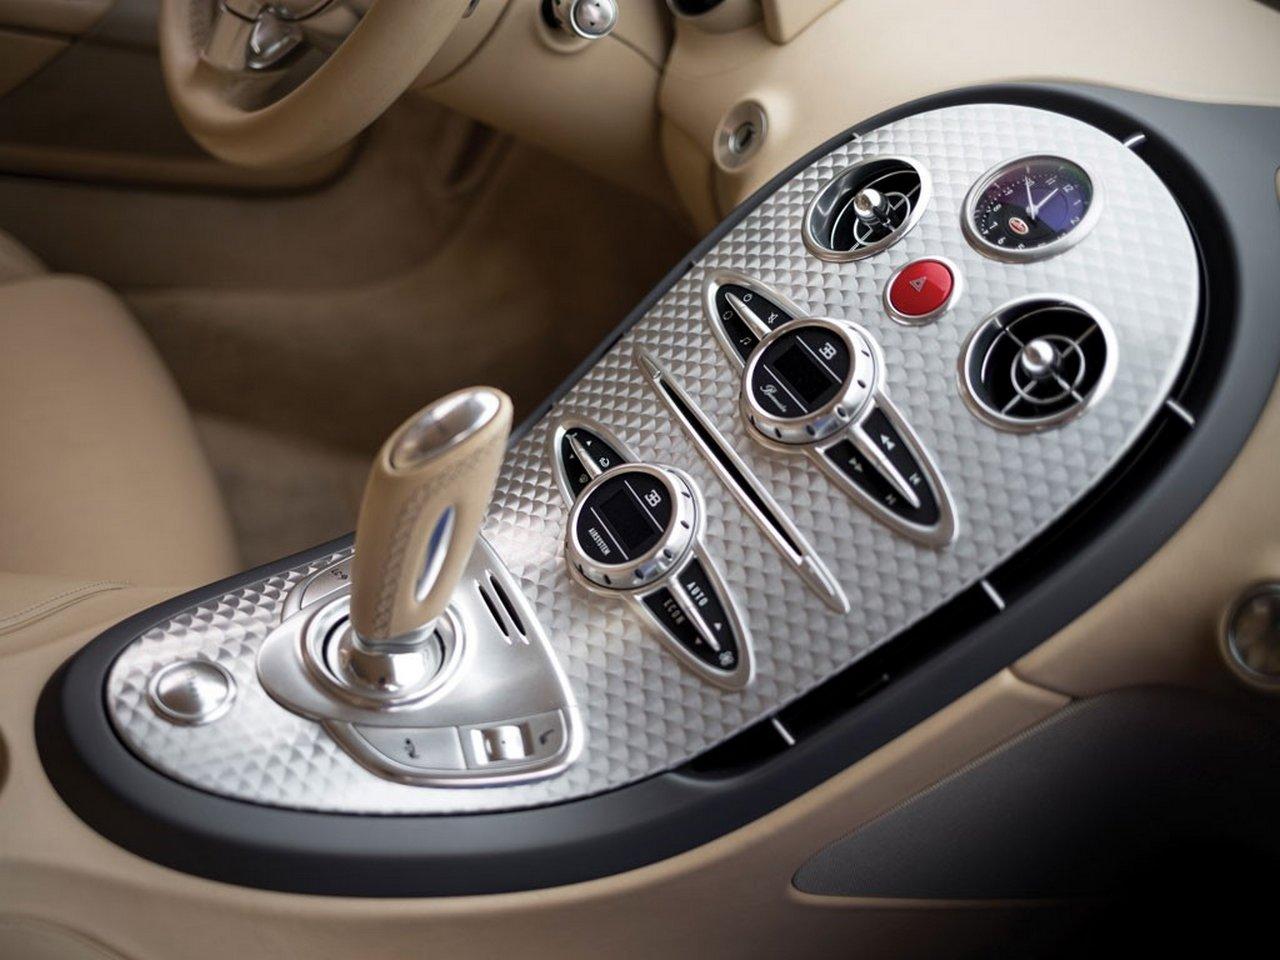 bugatti-veyron-001-2005-rm-auction-0-100-5